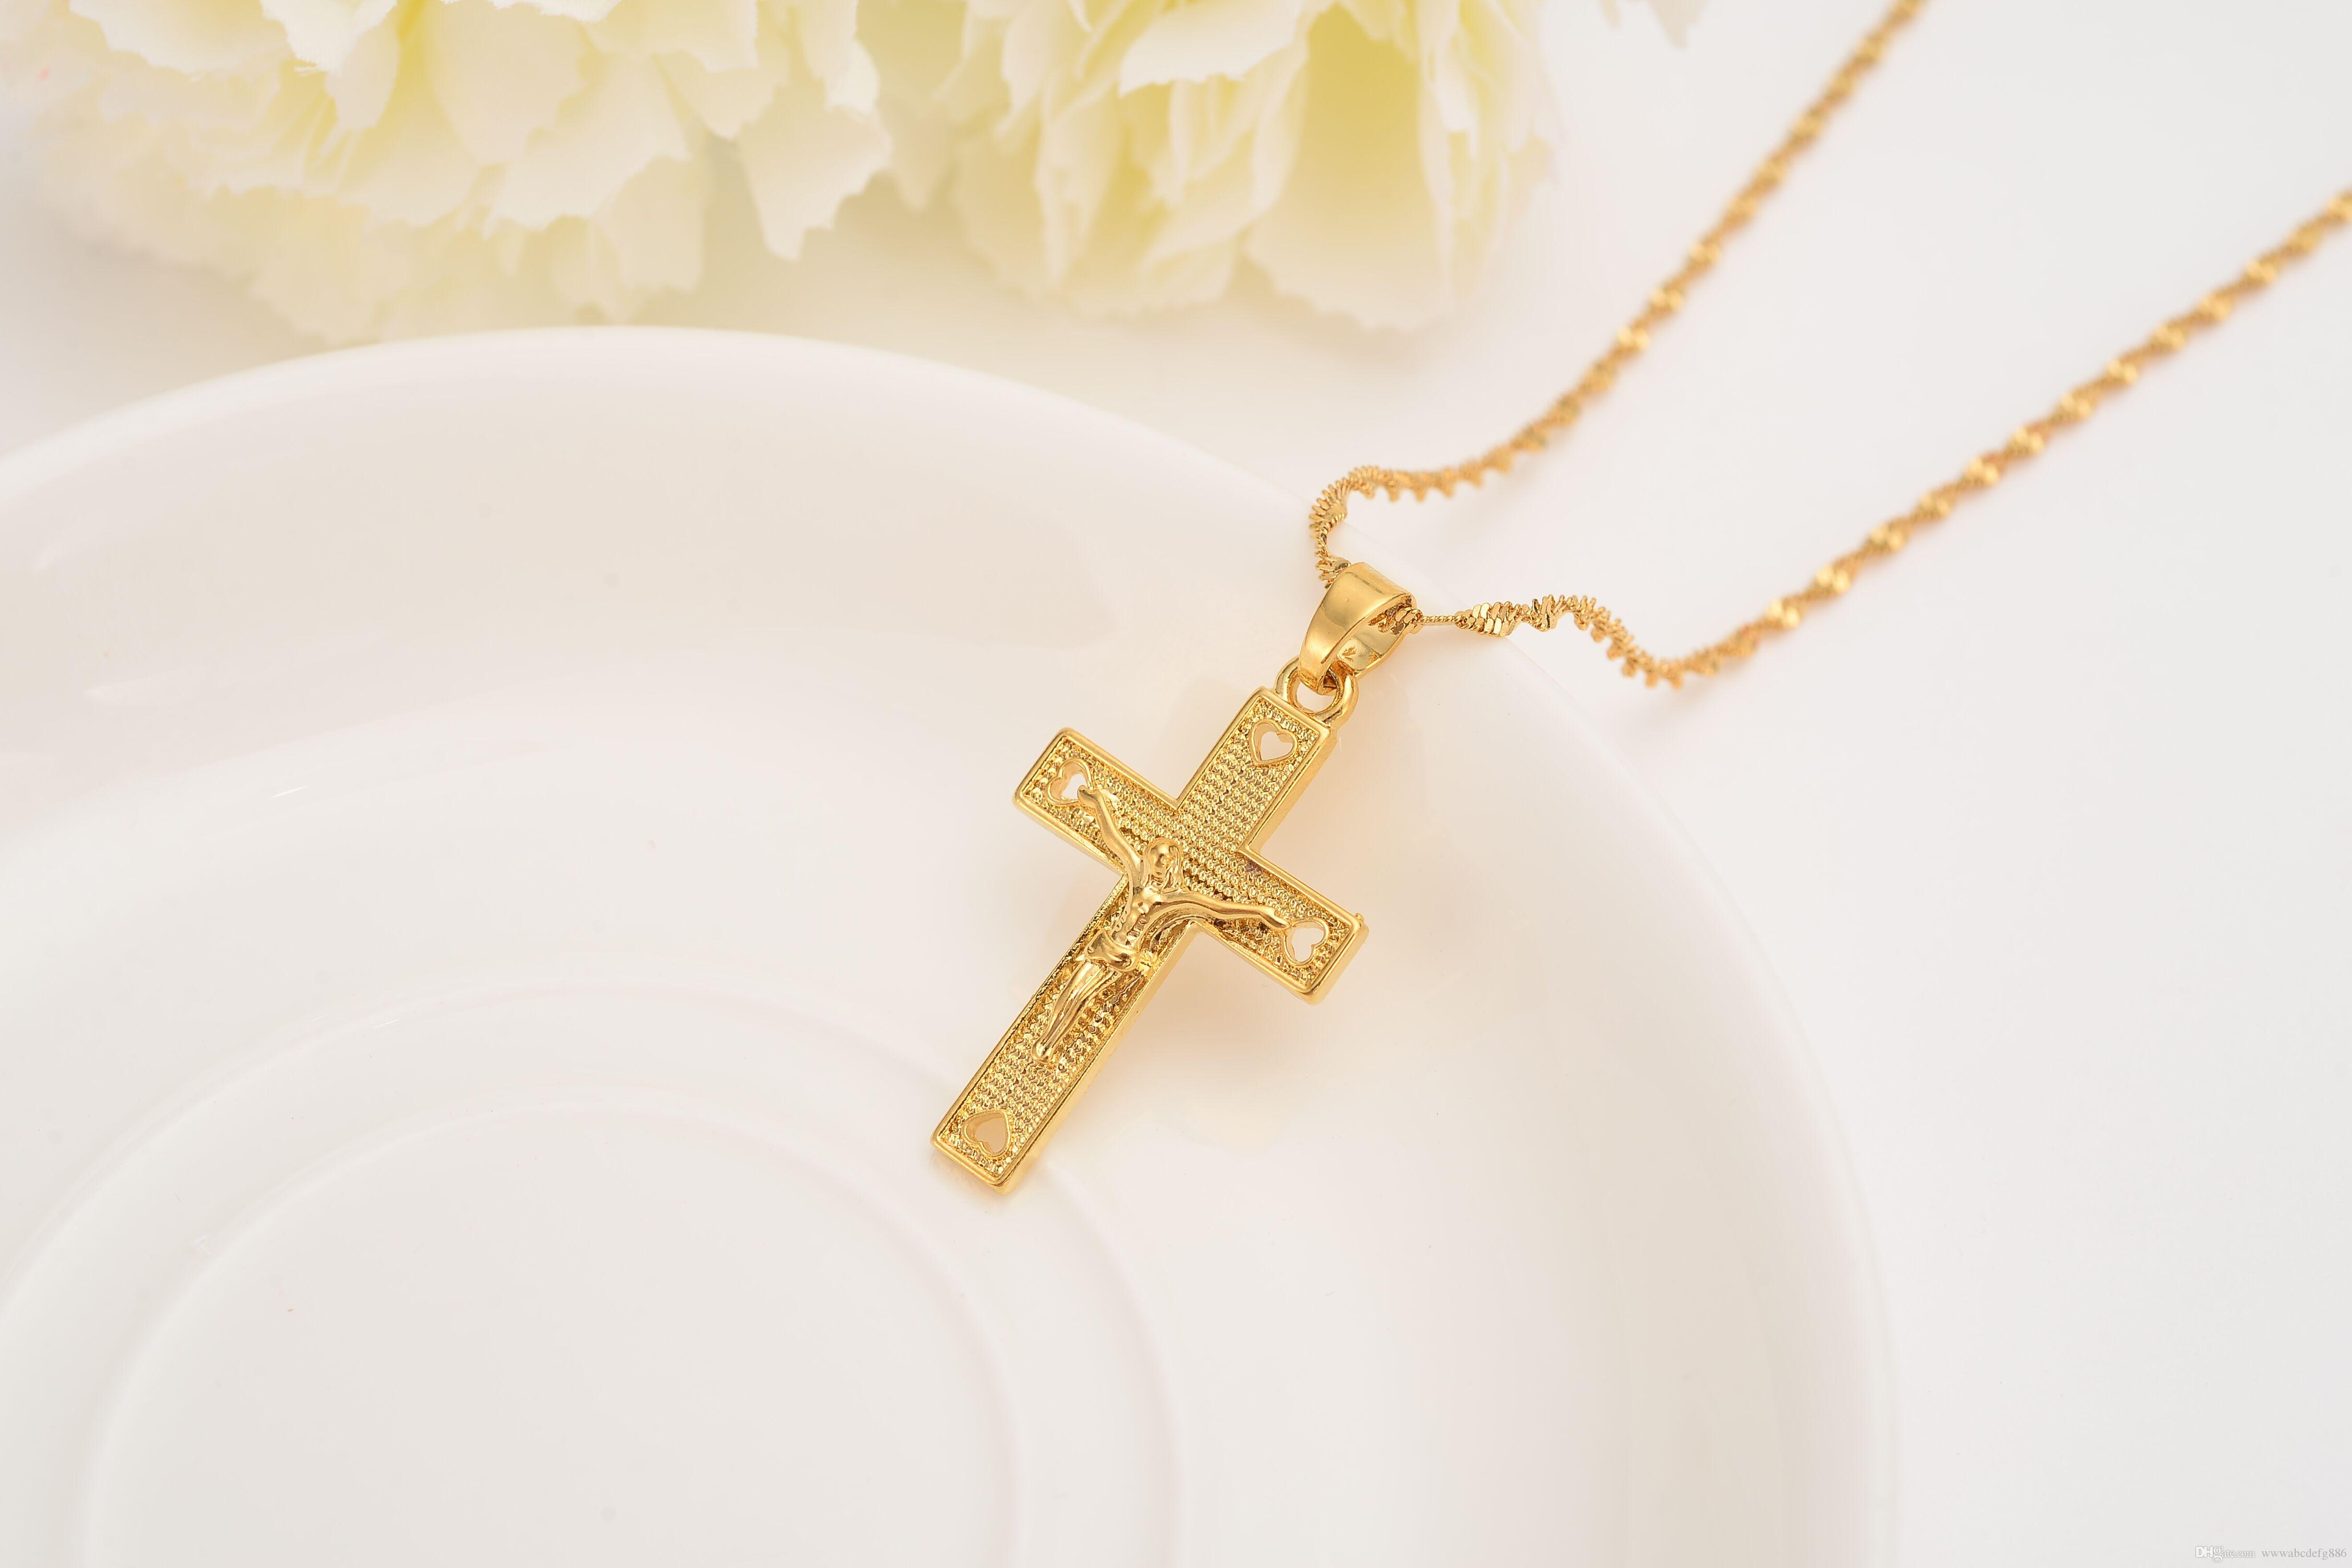 Wholesale Men 24 K Solid Gold Gf Cross Necklaces Wholesale Crucifix Pendant Women Jewelry Fashion Jesus Decoration Dress Necklace Charmcelets From